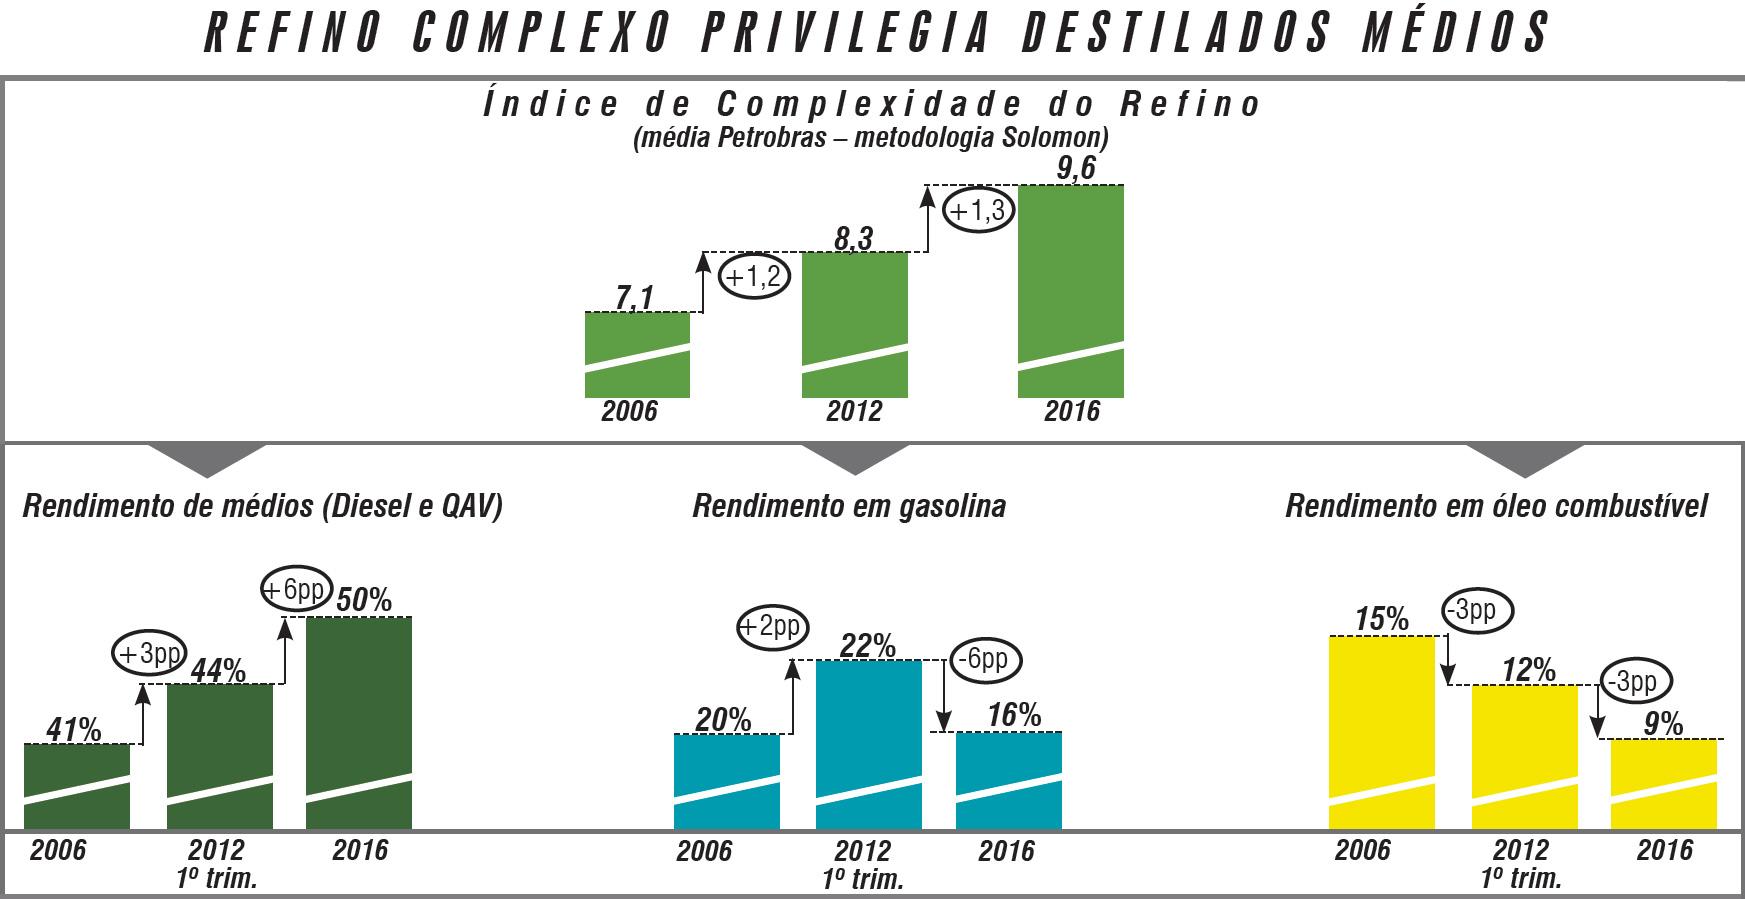 Química e Derivados, Refino complexo privilegia destilados médios, Petrobras